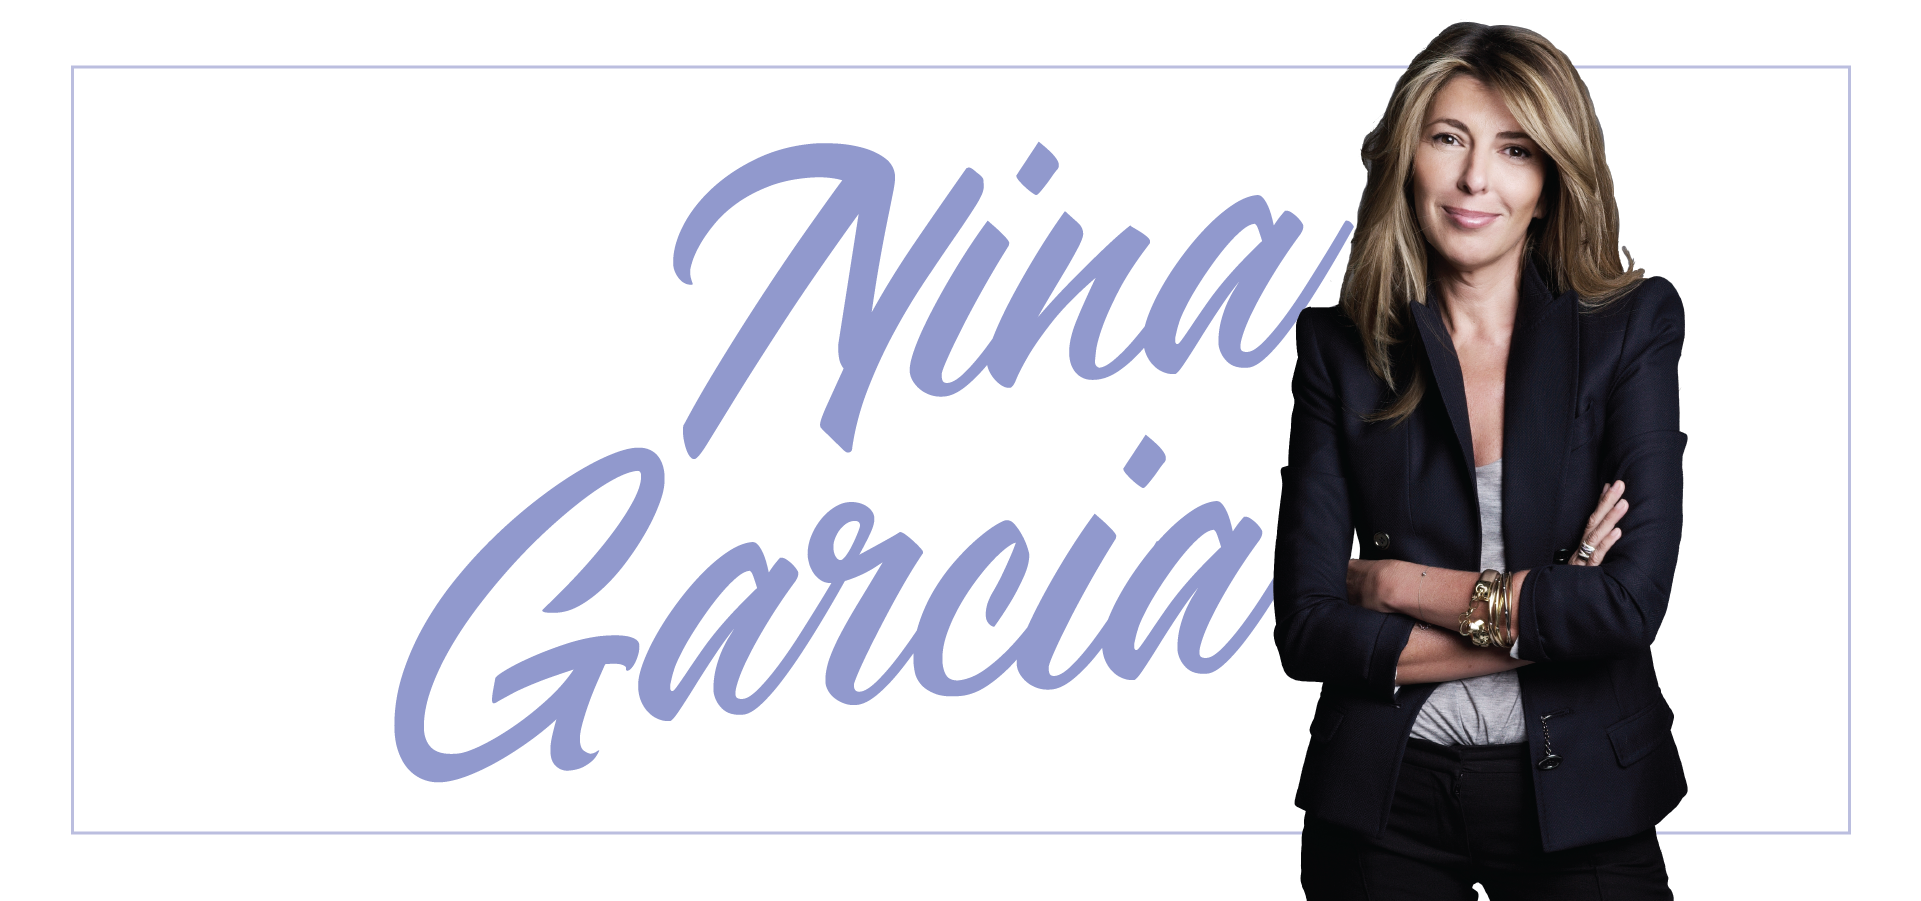 Nina_Garcia_Header.png